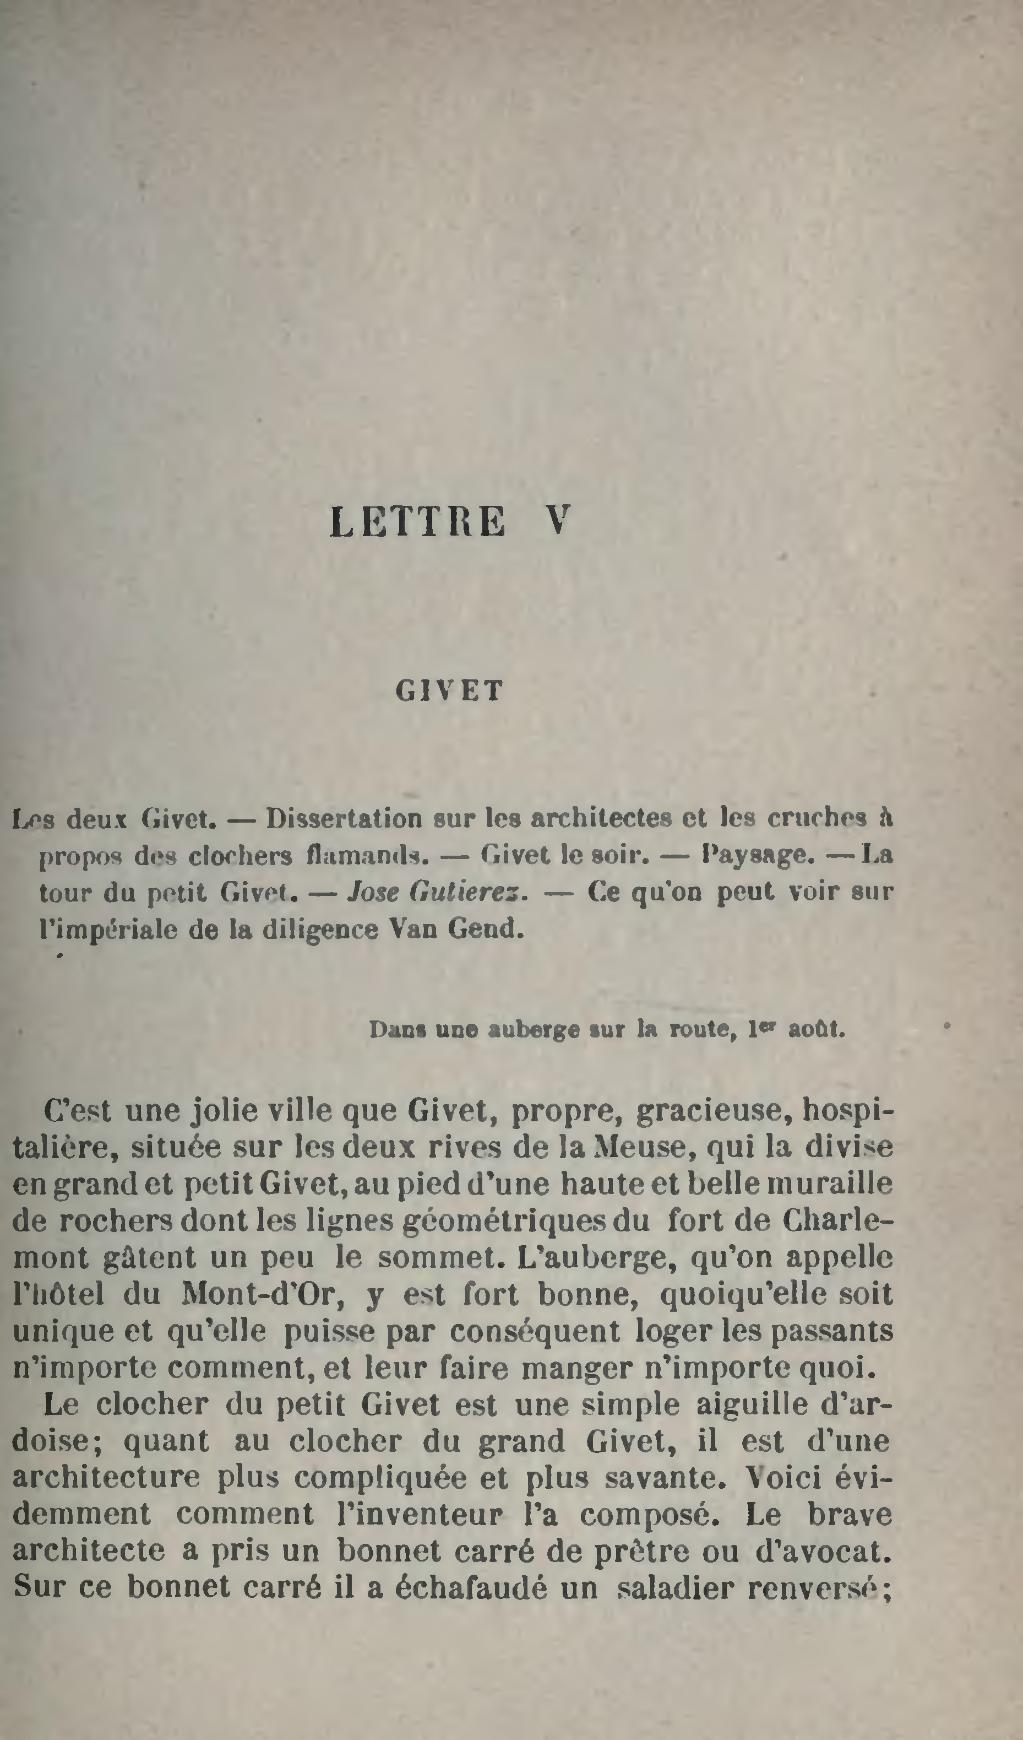 dissertation victor hugo lettre a hetzel